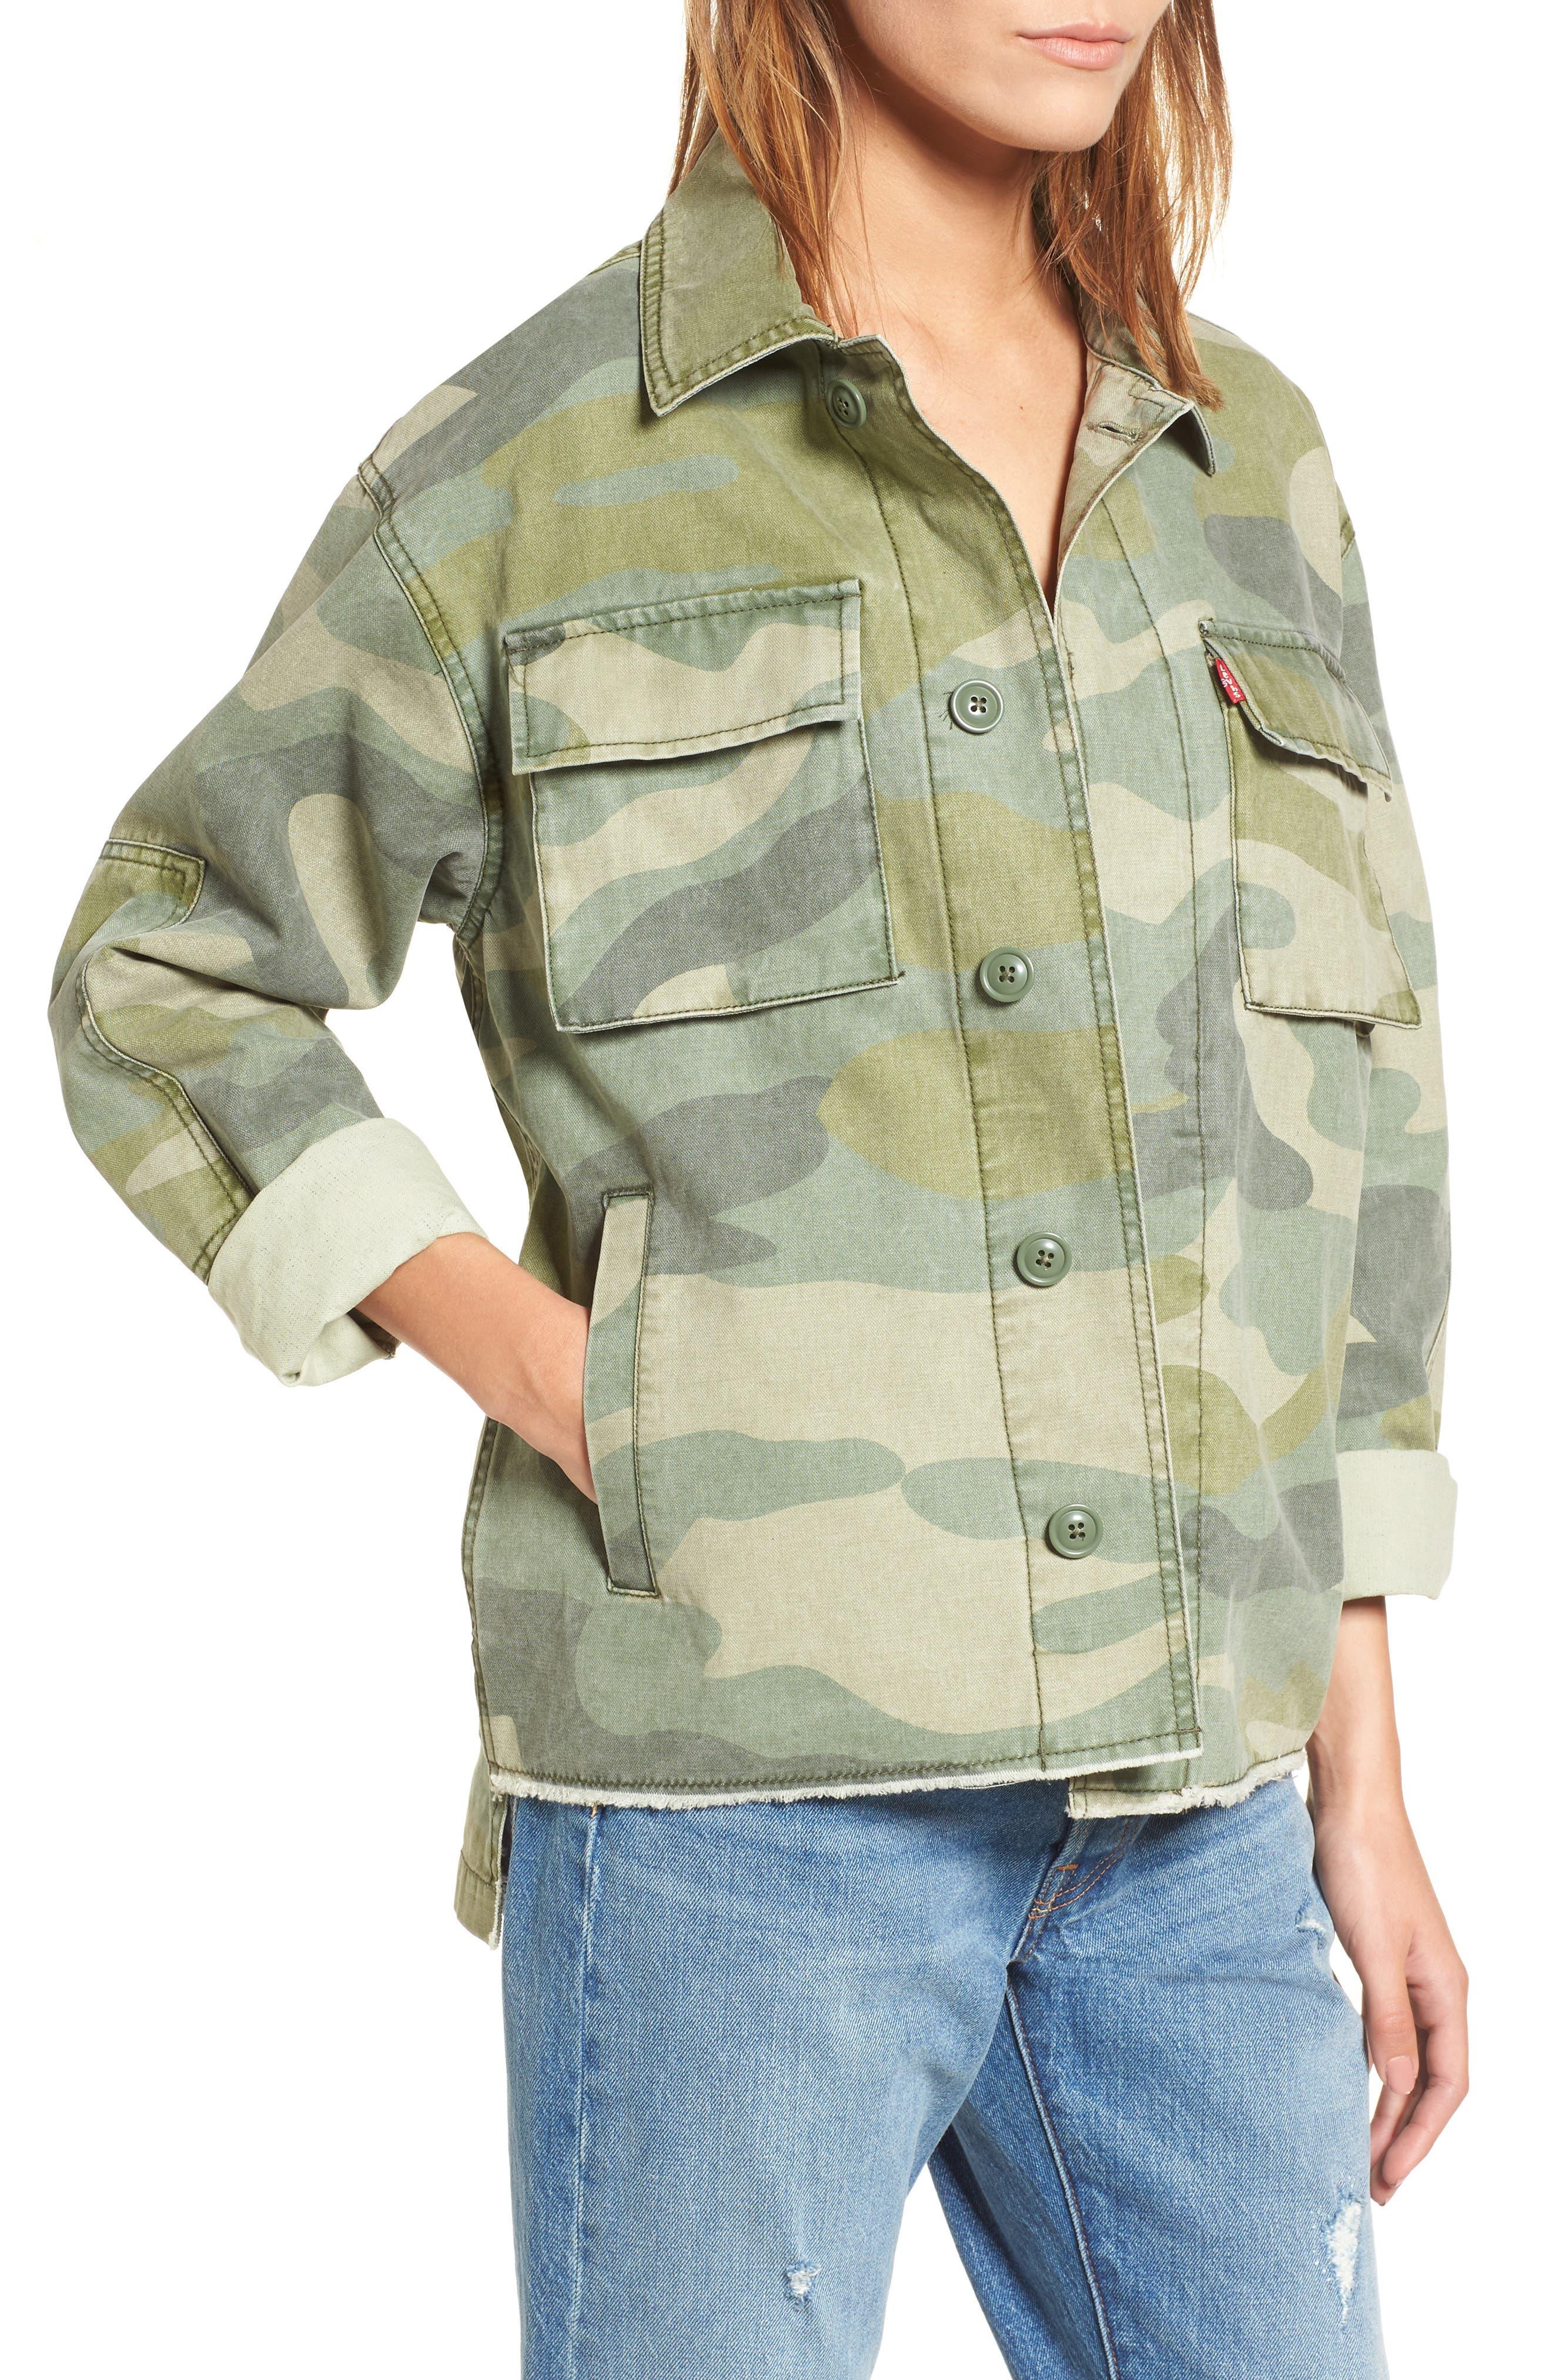 Alternate Image 1 Selected - Levi's® Oversize Cotton Canvas Camo Shirt Jacket